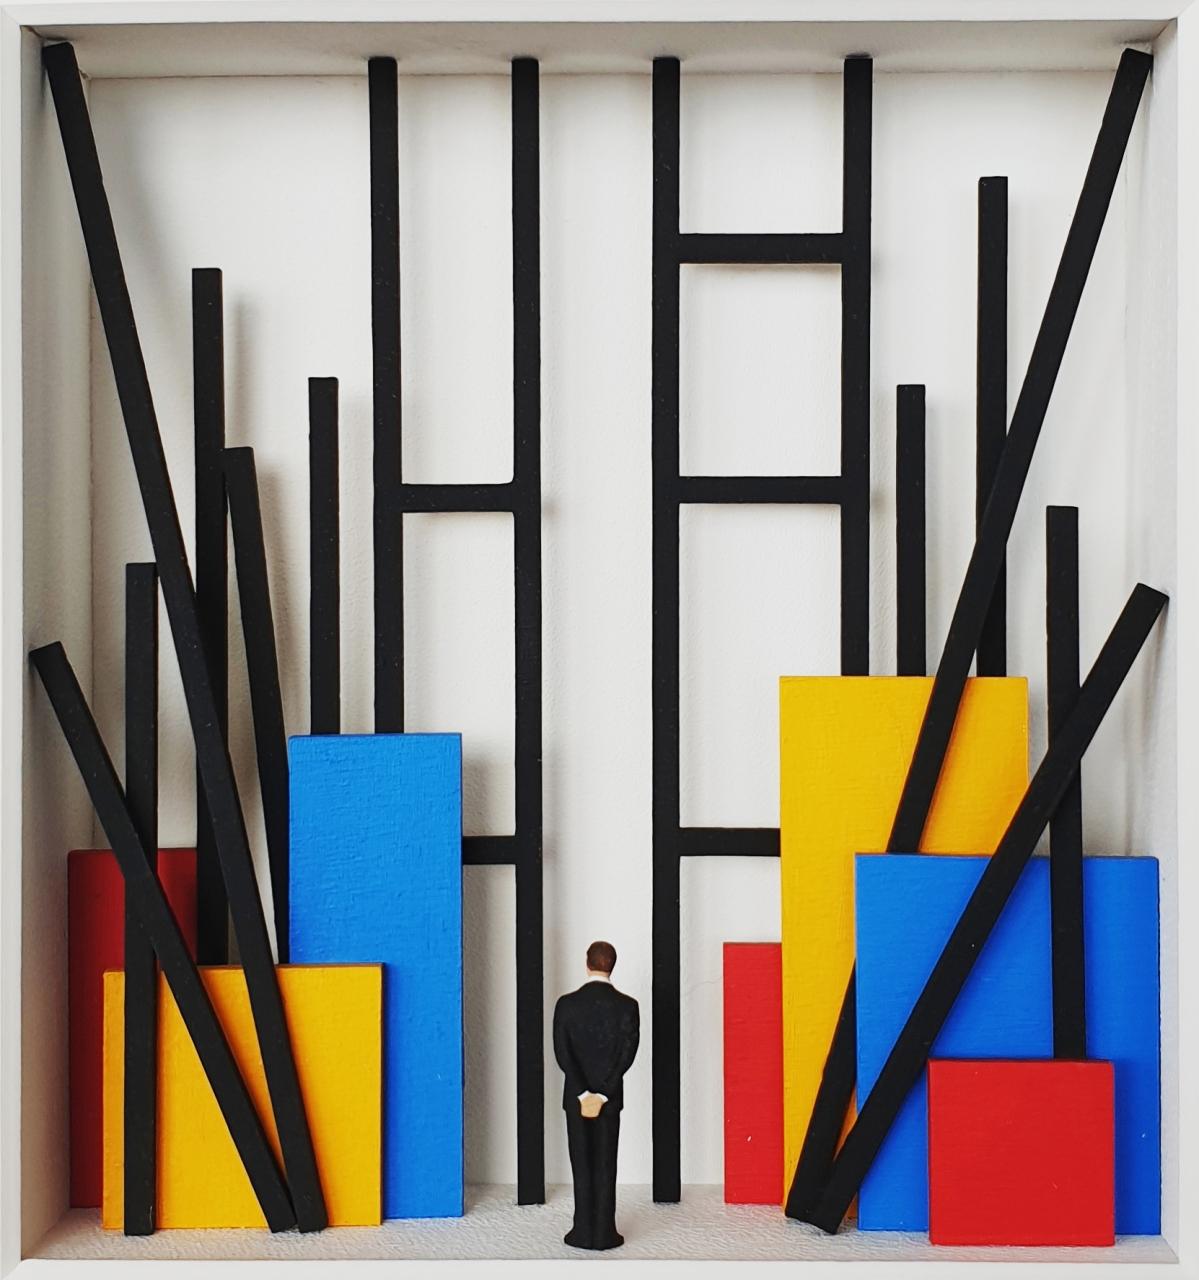 Construction of Mondrian - Homage à Mondrian